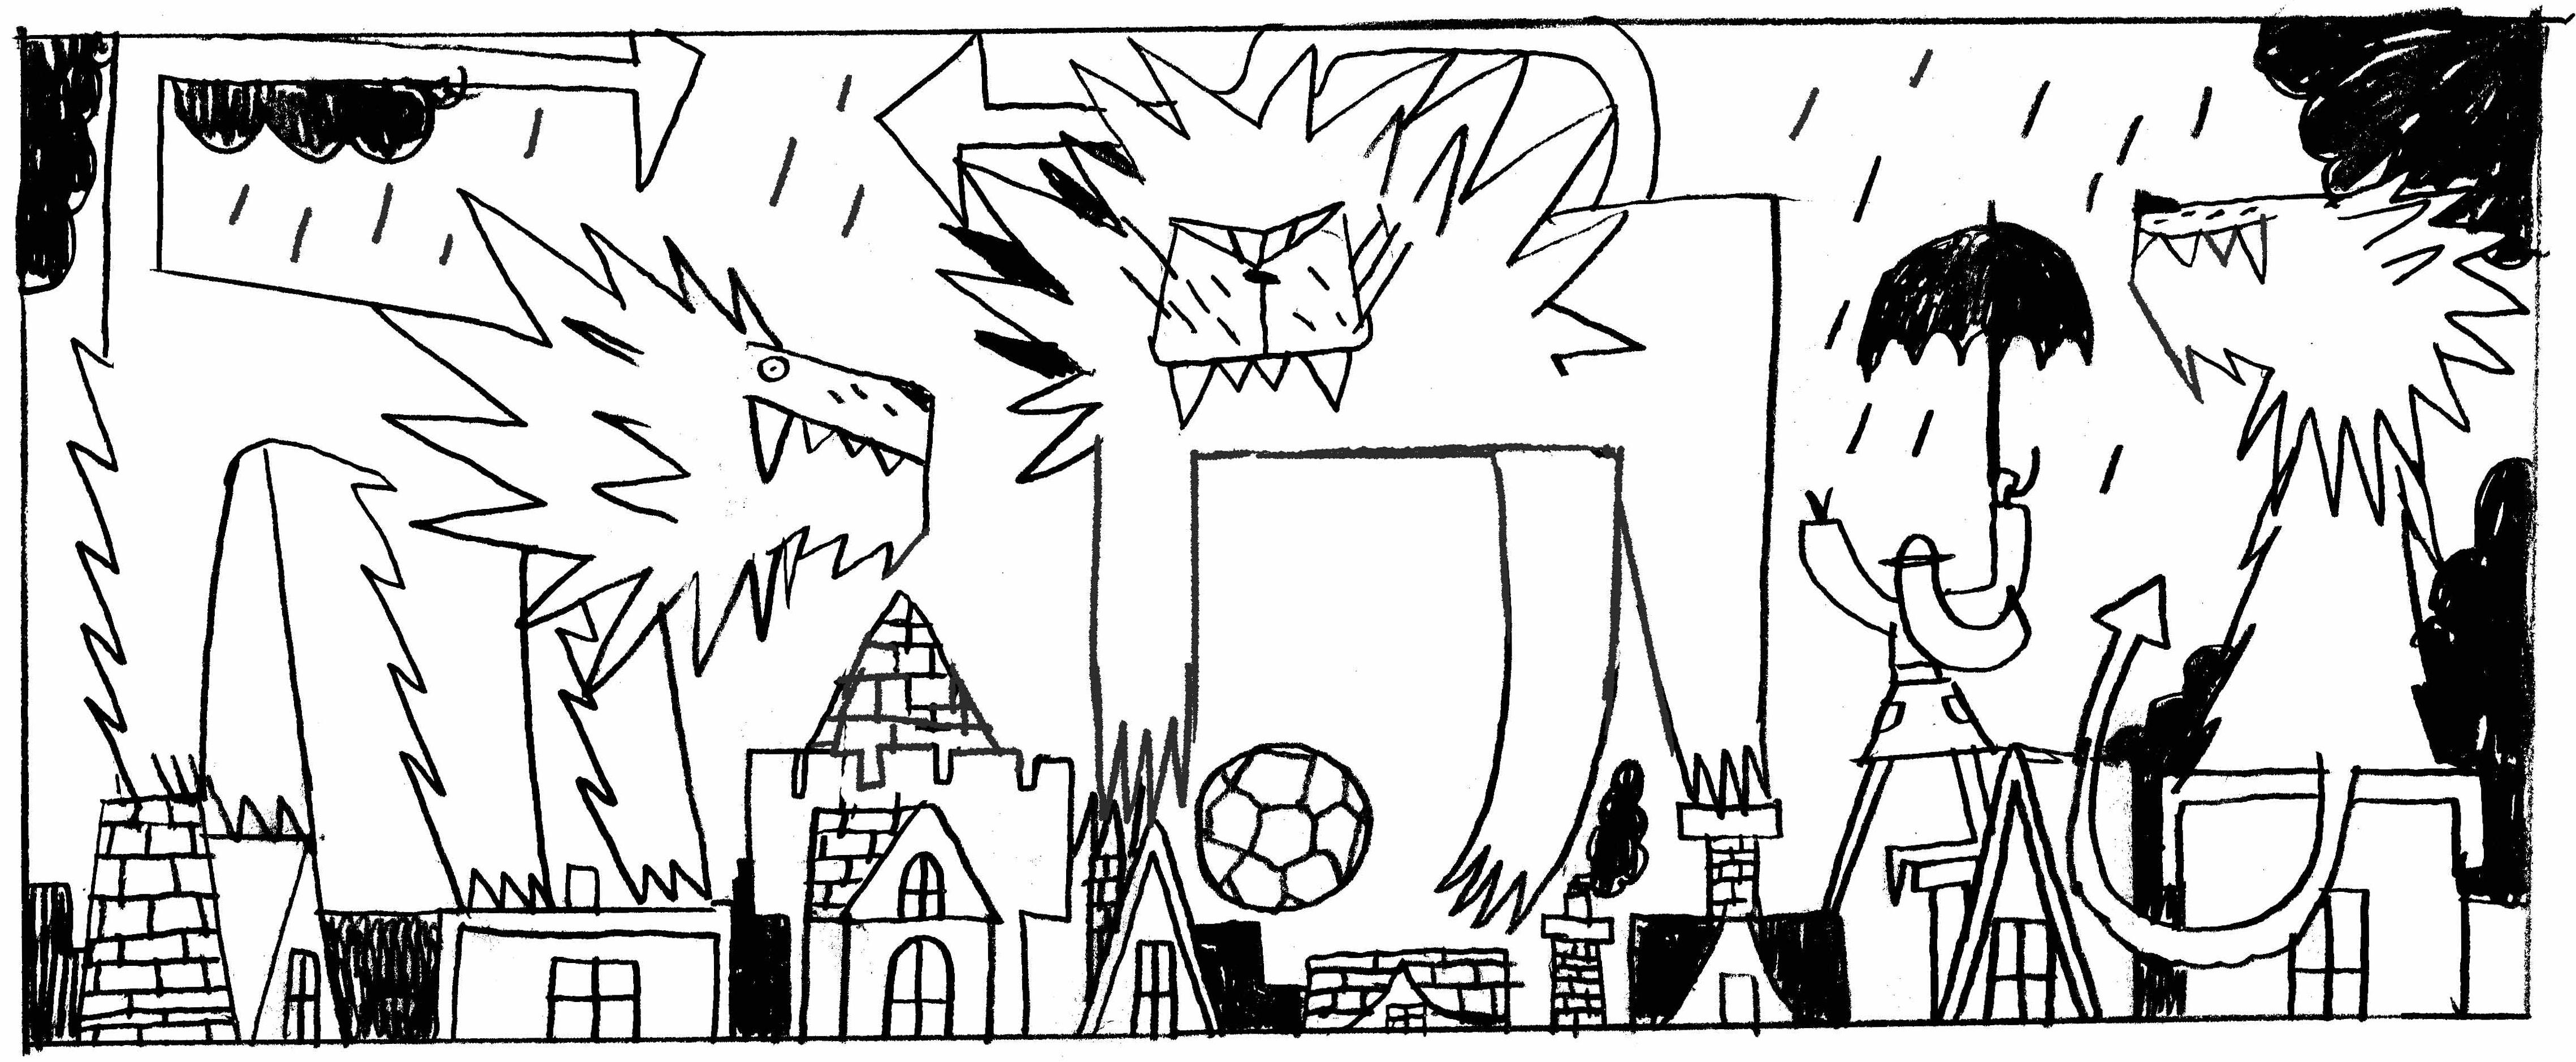 England World Cup Doodle Sketch